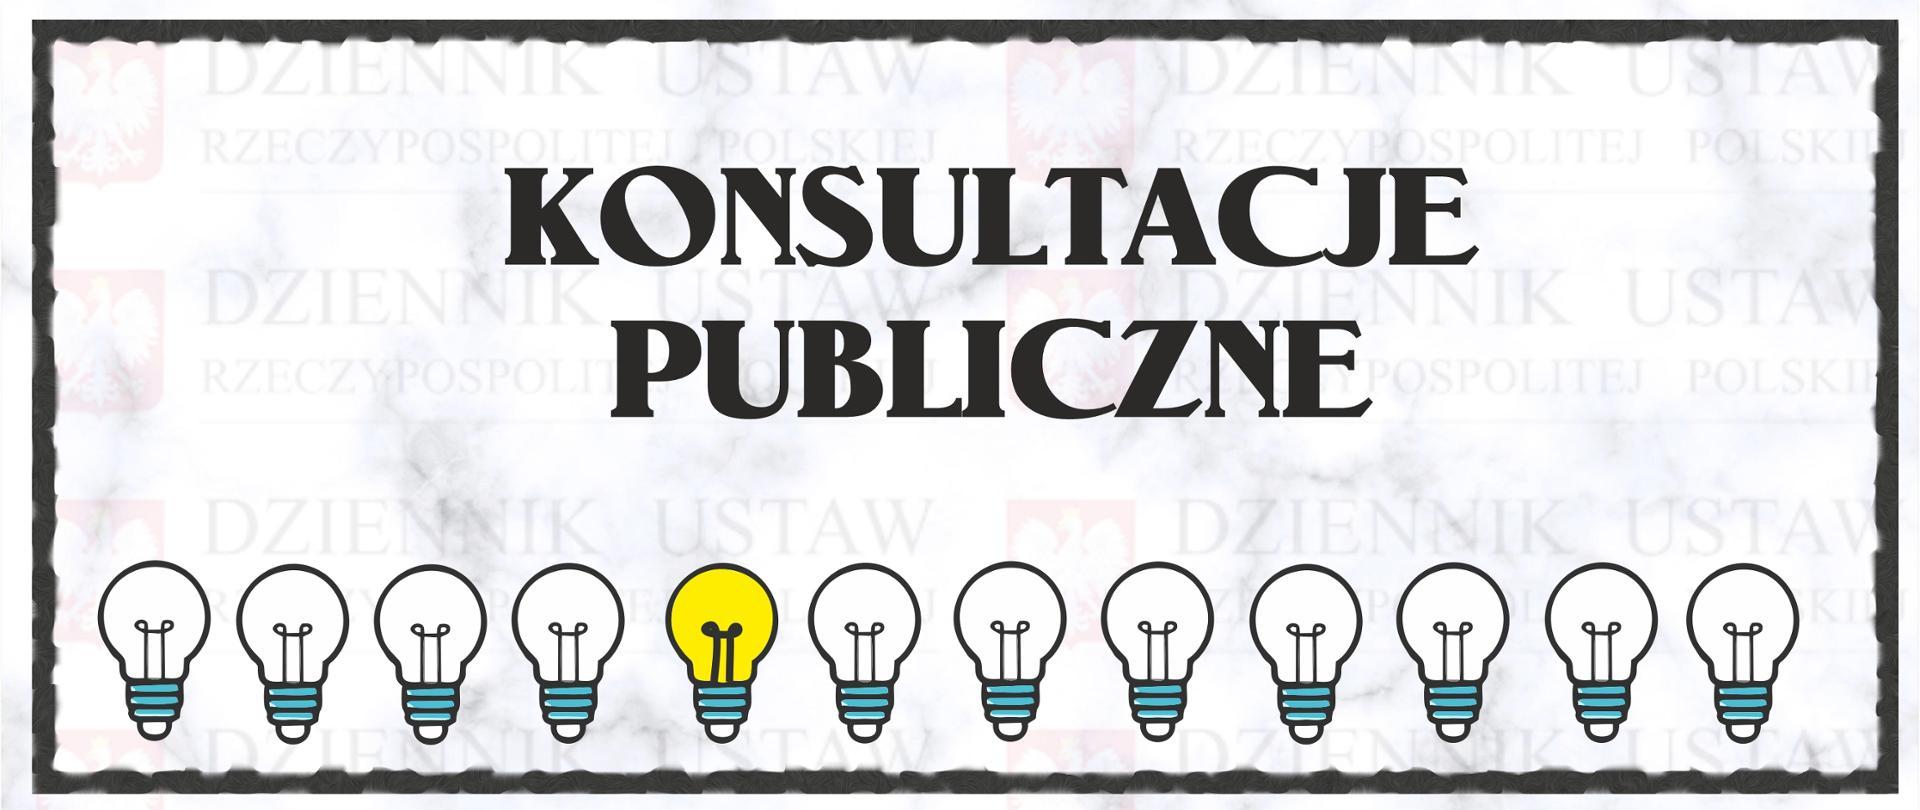 Konsultacje publiczne